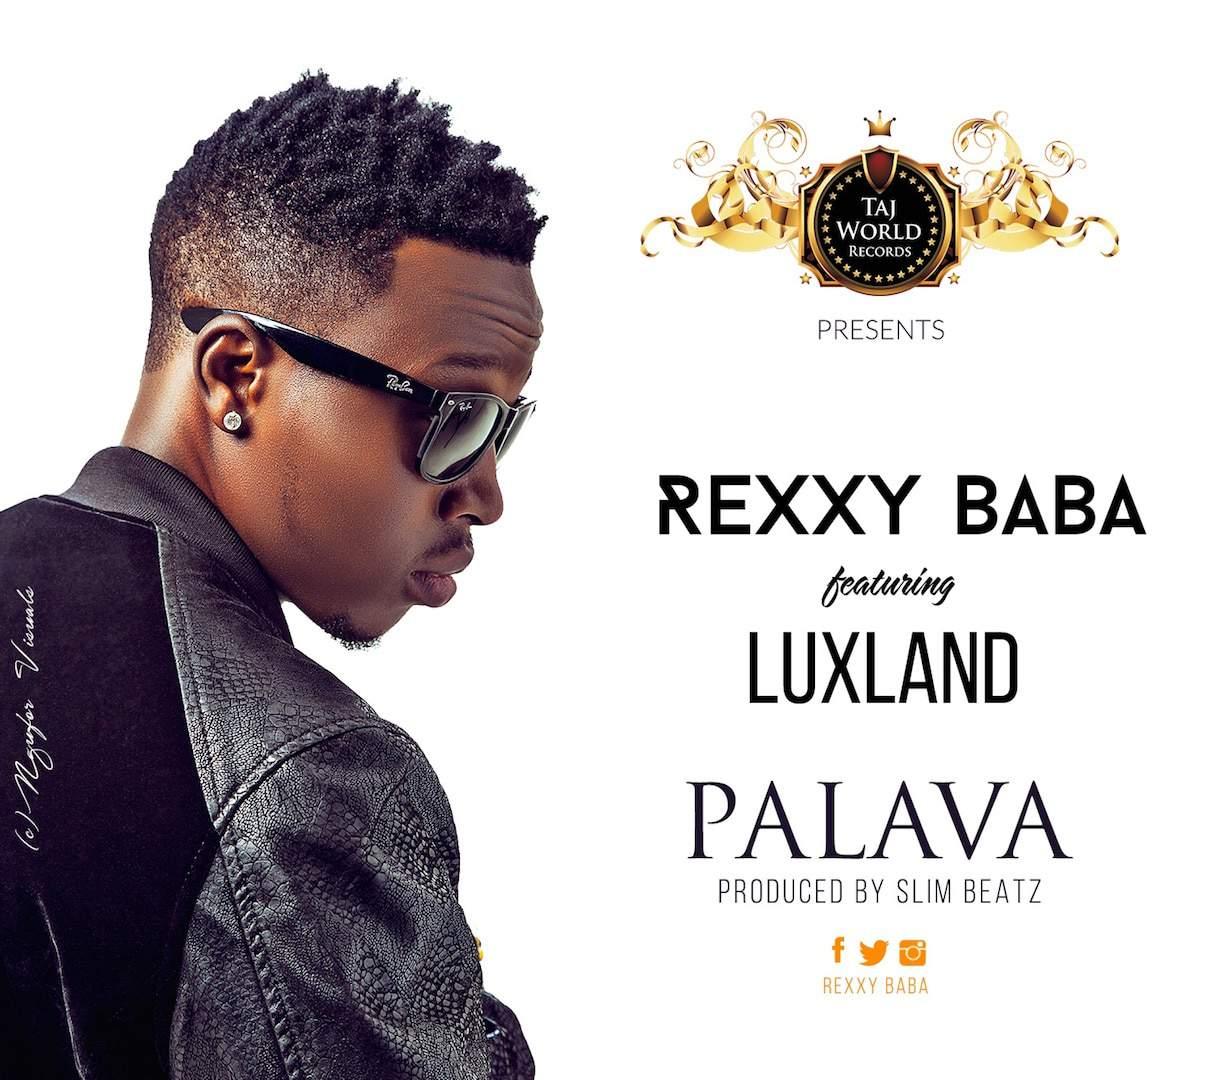 Rexxy Baba ft Luxland - Palava -  Taj World Records